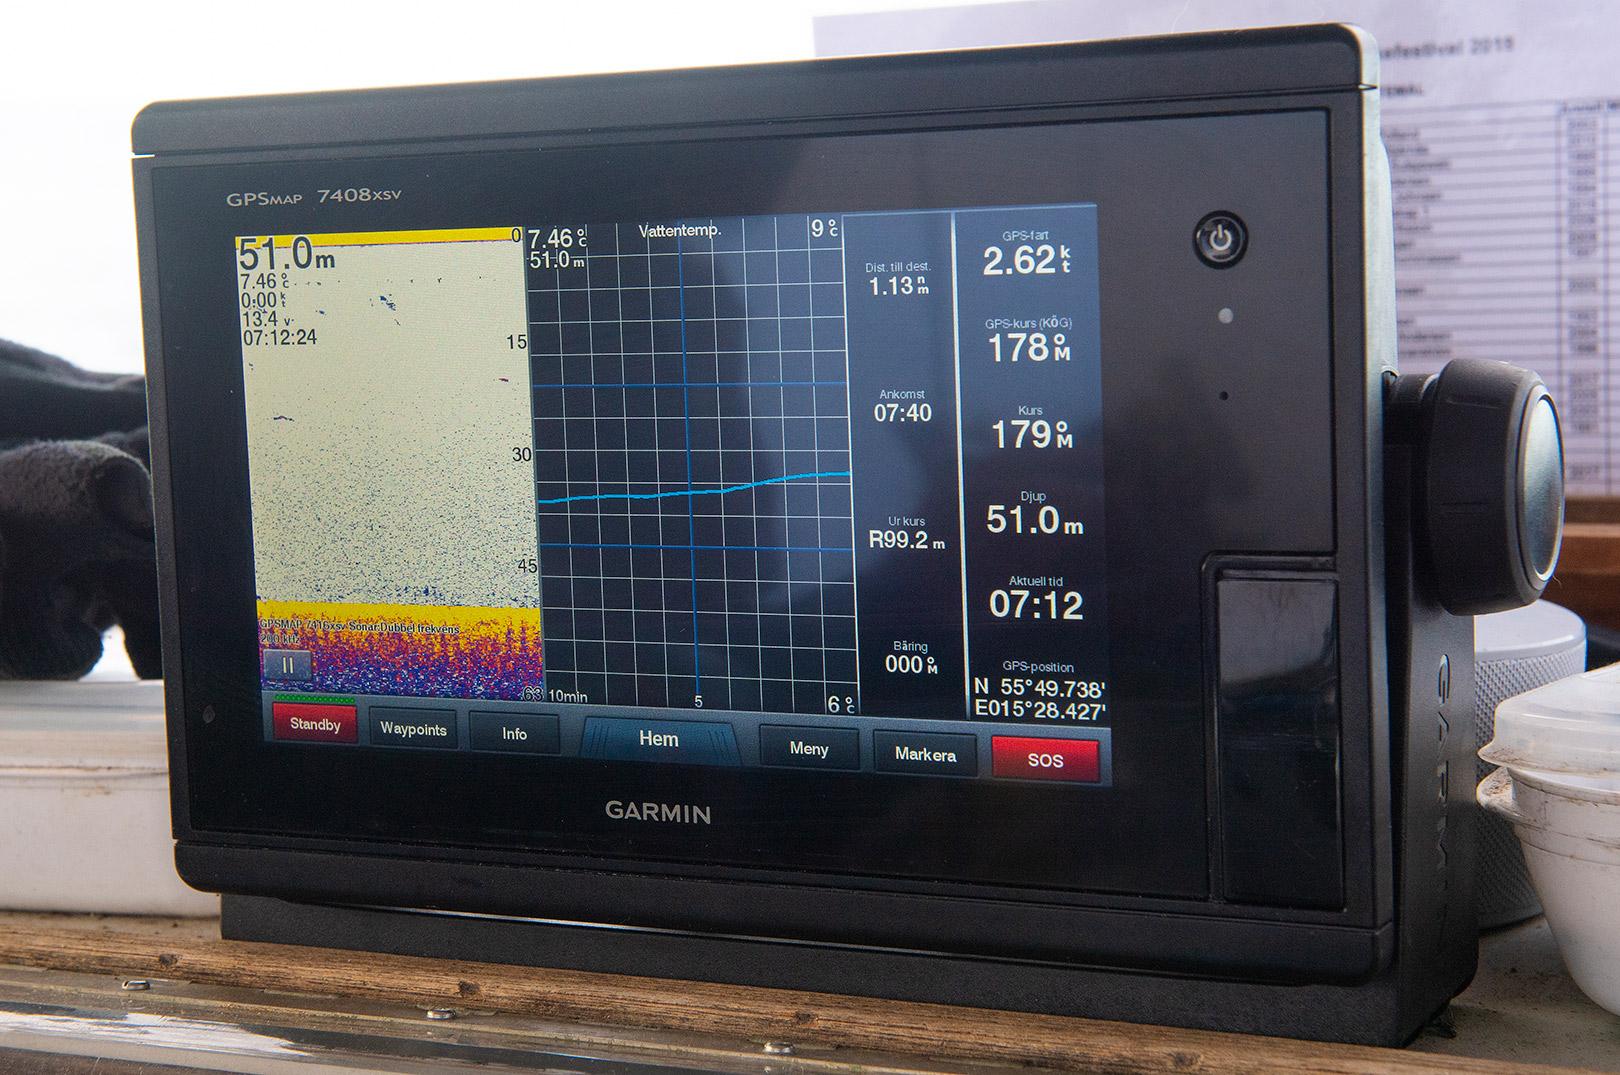 Pelle bruger marineelektronik fra Garmin